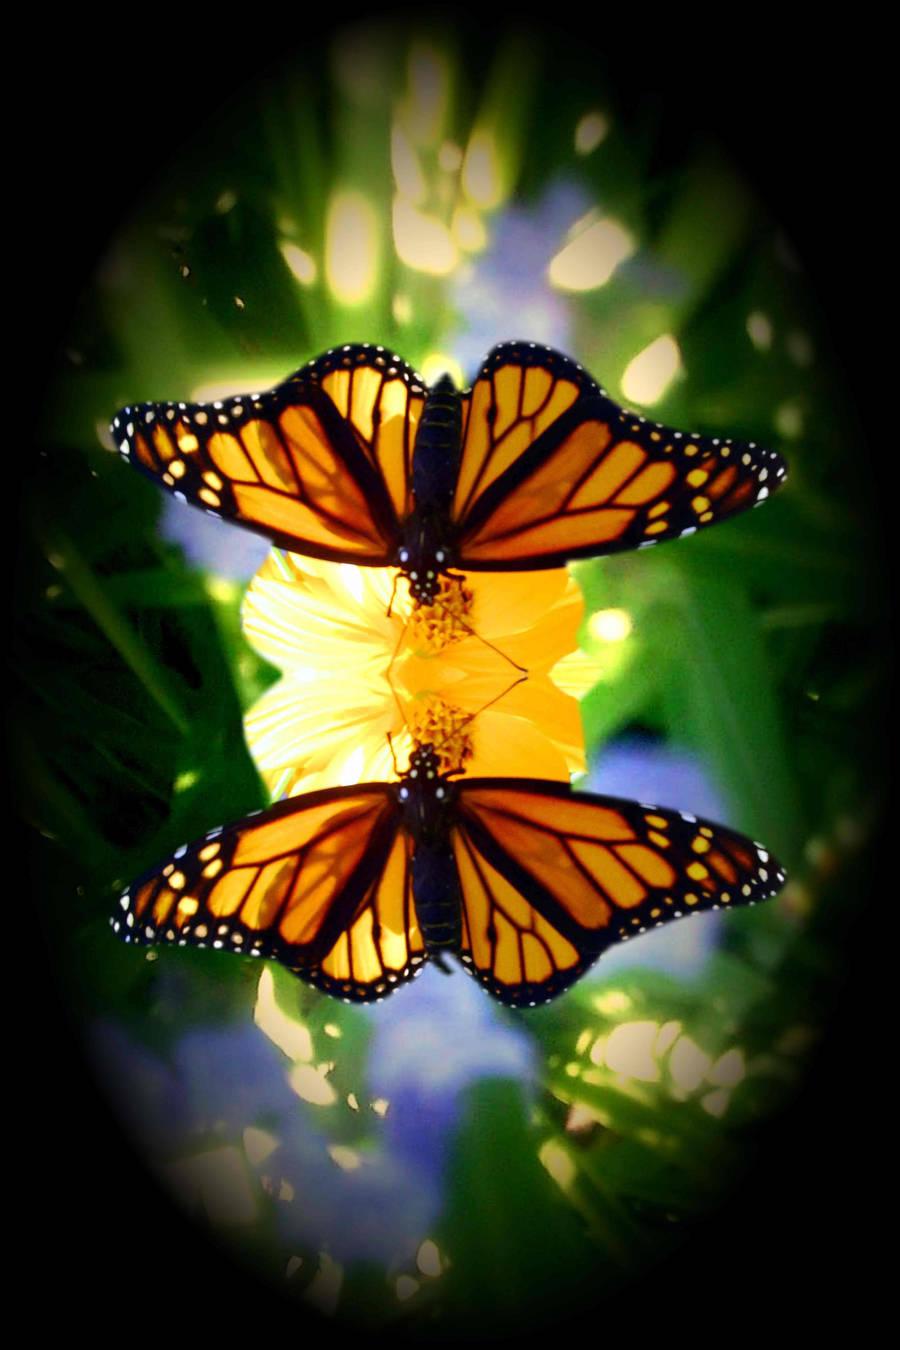 monarchs by KenshinKyo